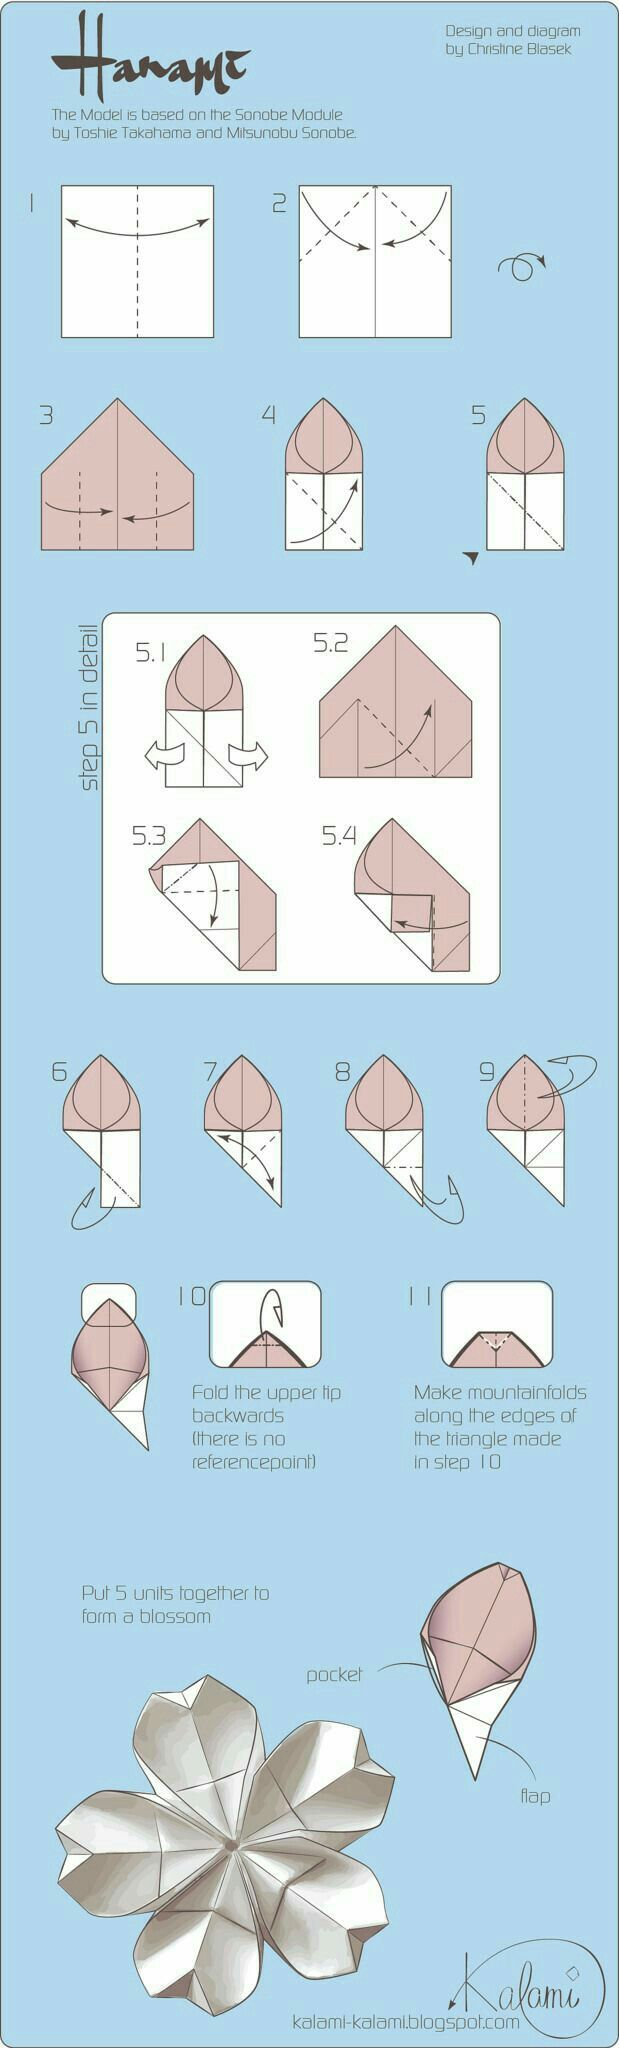 Origami Module Instructions Google Search Paper Crafts Bird Curler Diagram Kusudama Me Craftsorigami Pinterest Tutorial Diy Modular Blume Diagrams Folding Art